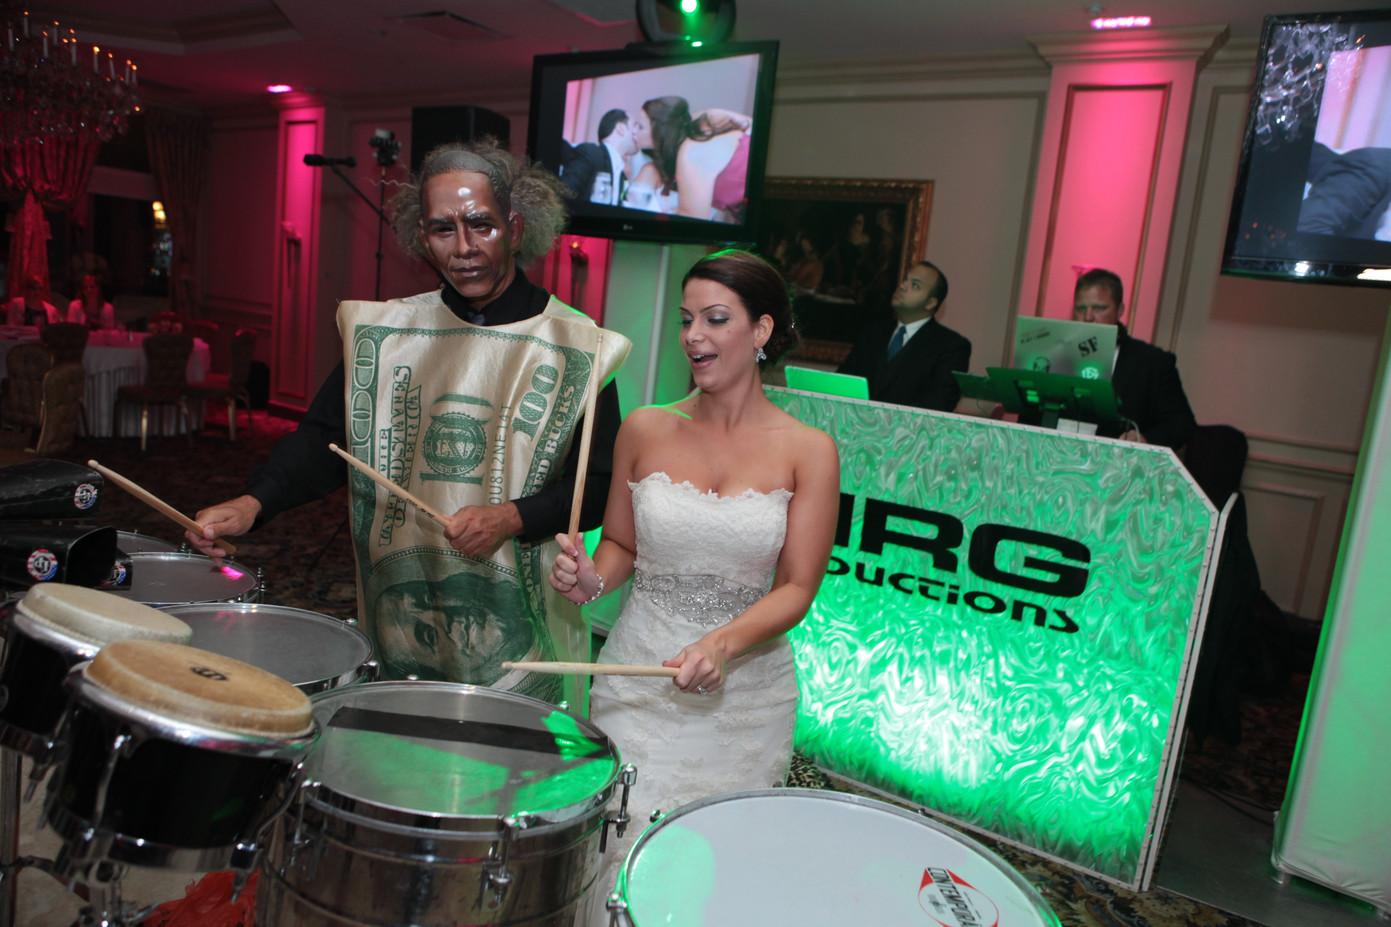 Costumed-Event-Percussionist.jpg